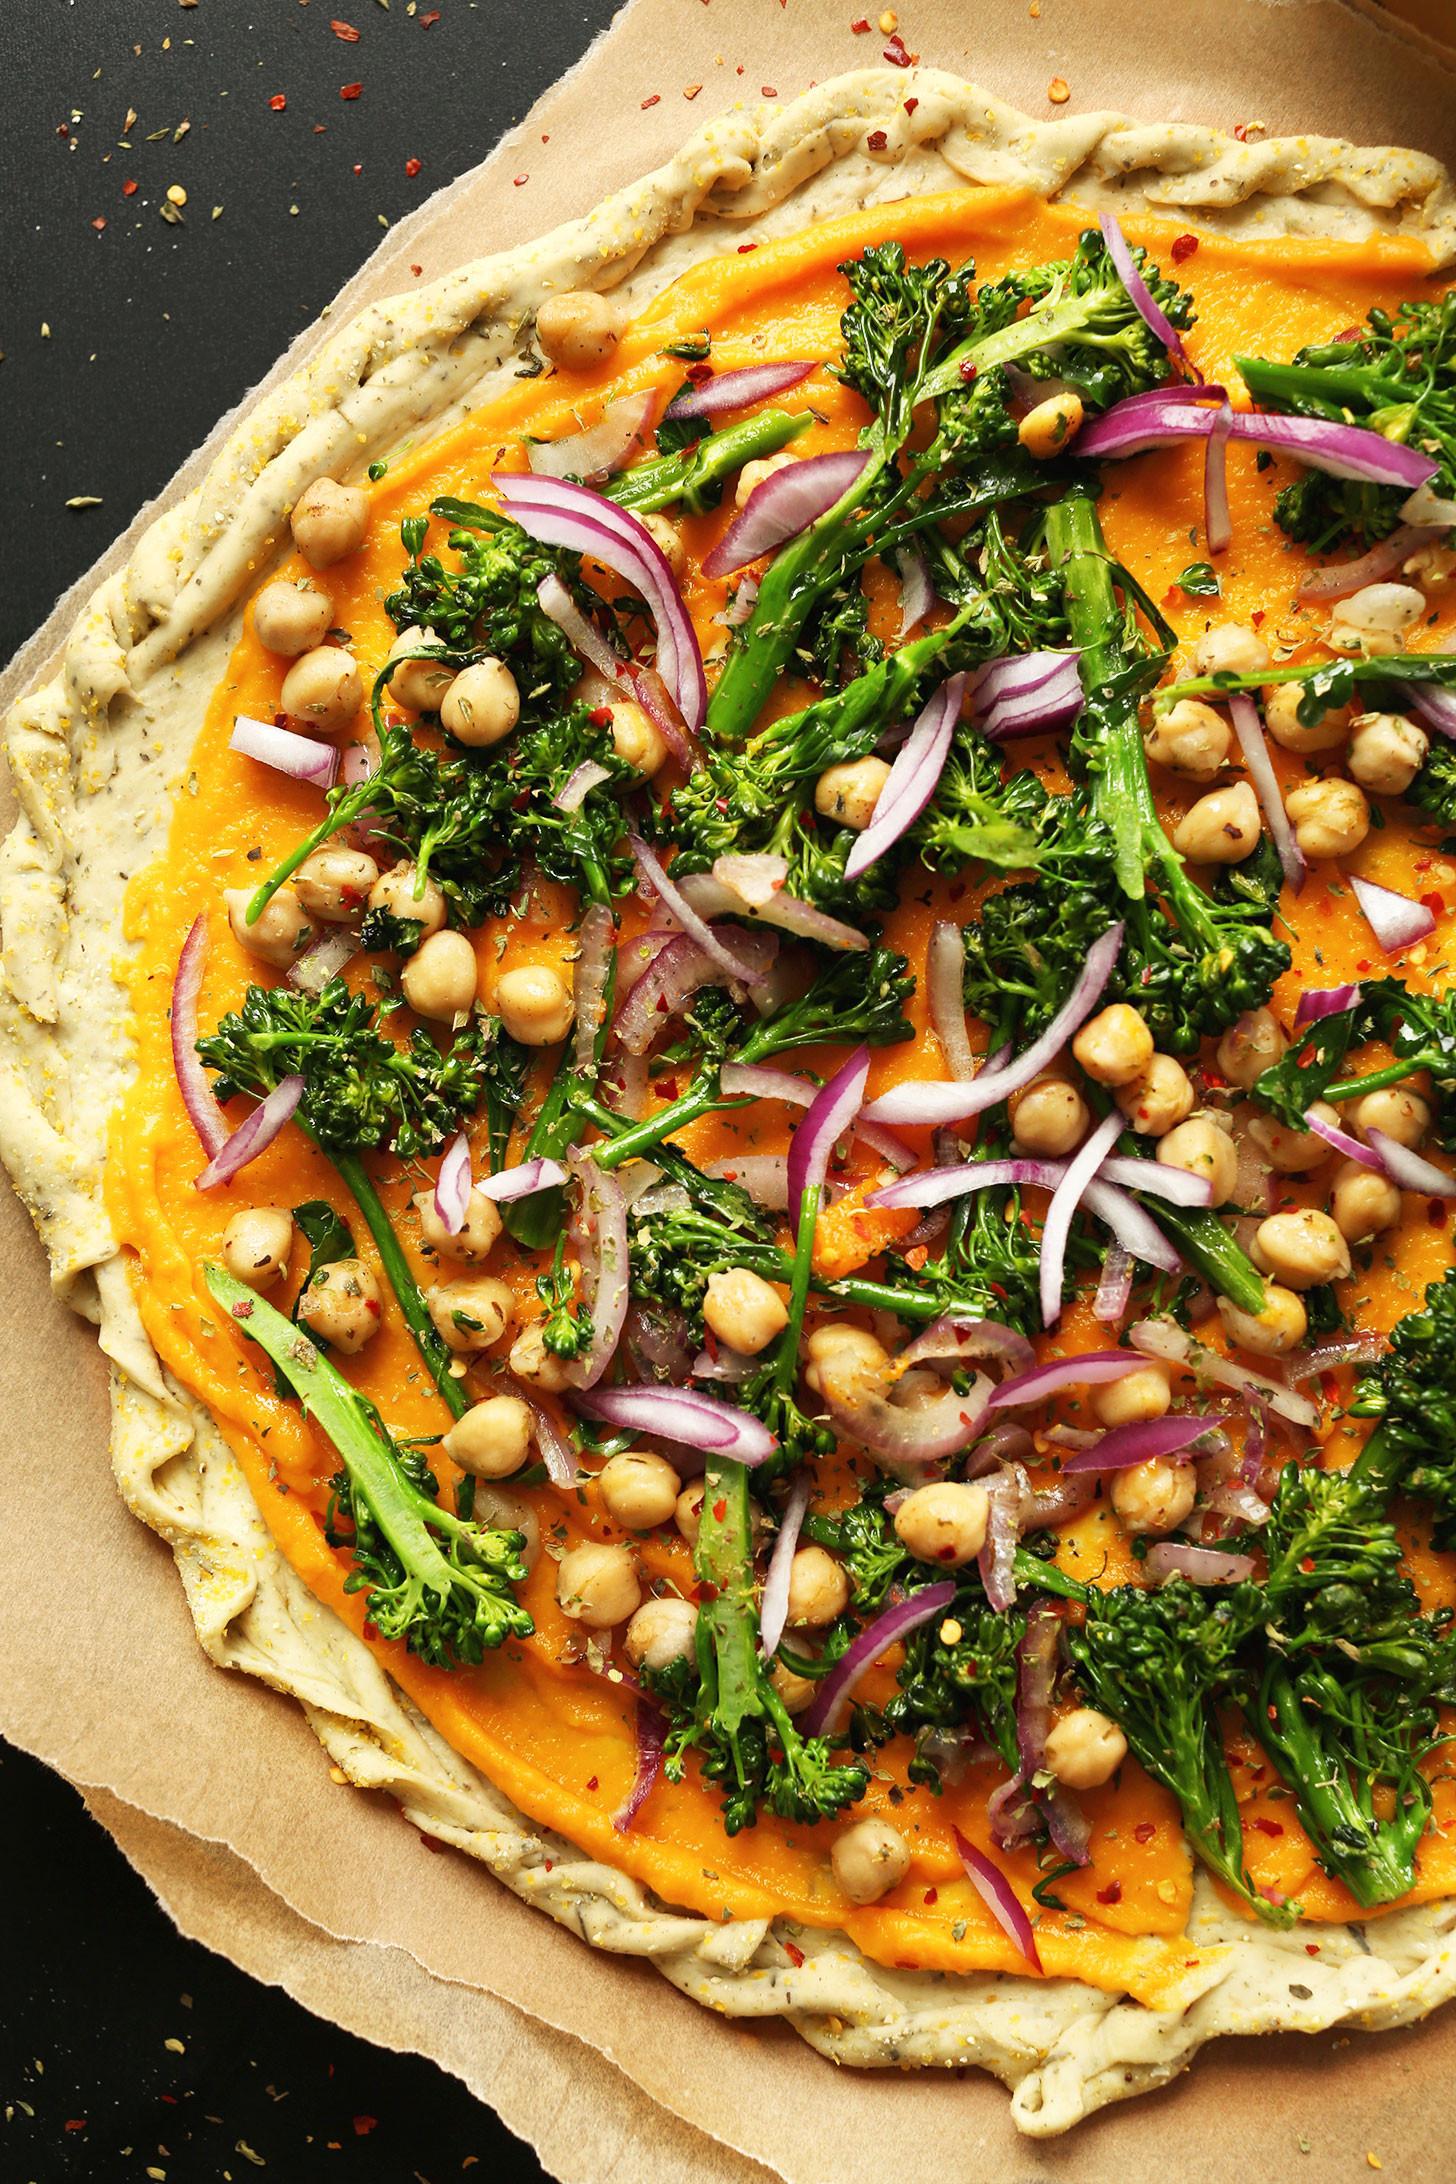 Vegan Recipes Healthy  Ultimate Vegan Pizza Recipe Round Up